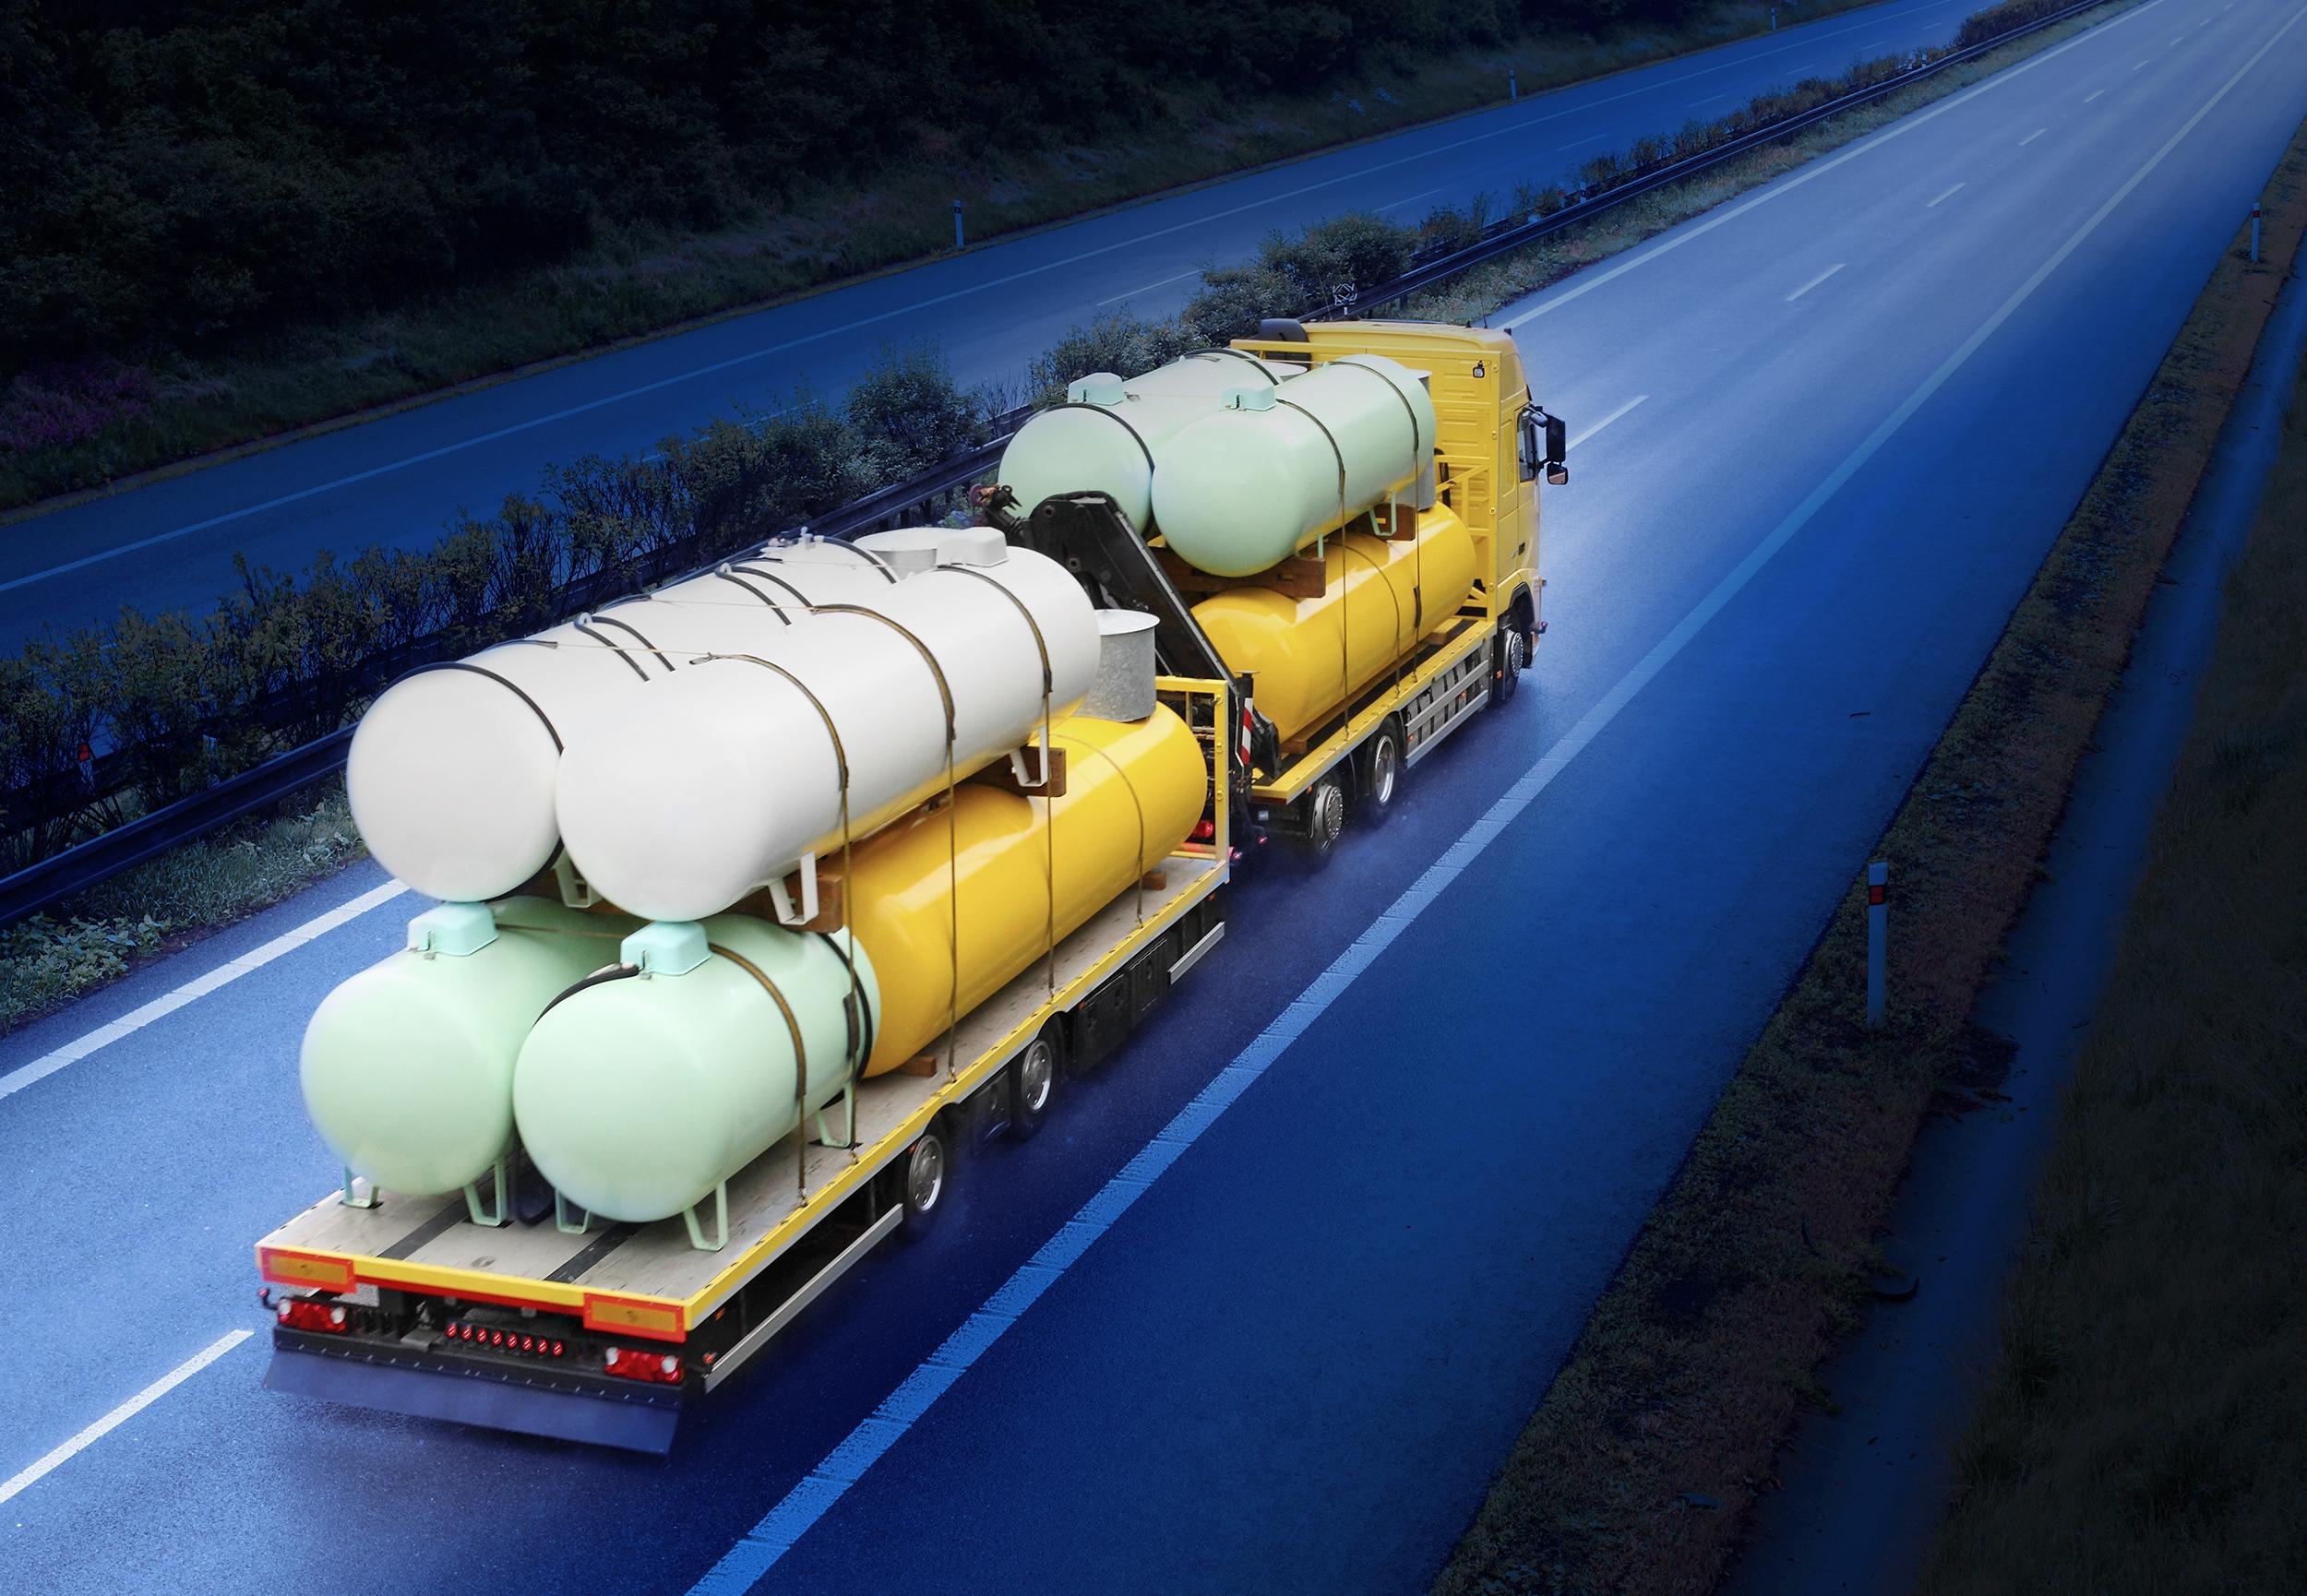 bts-fleet-management-systems.jpg